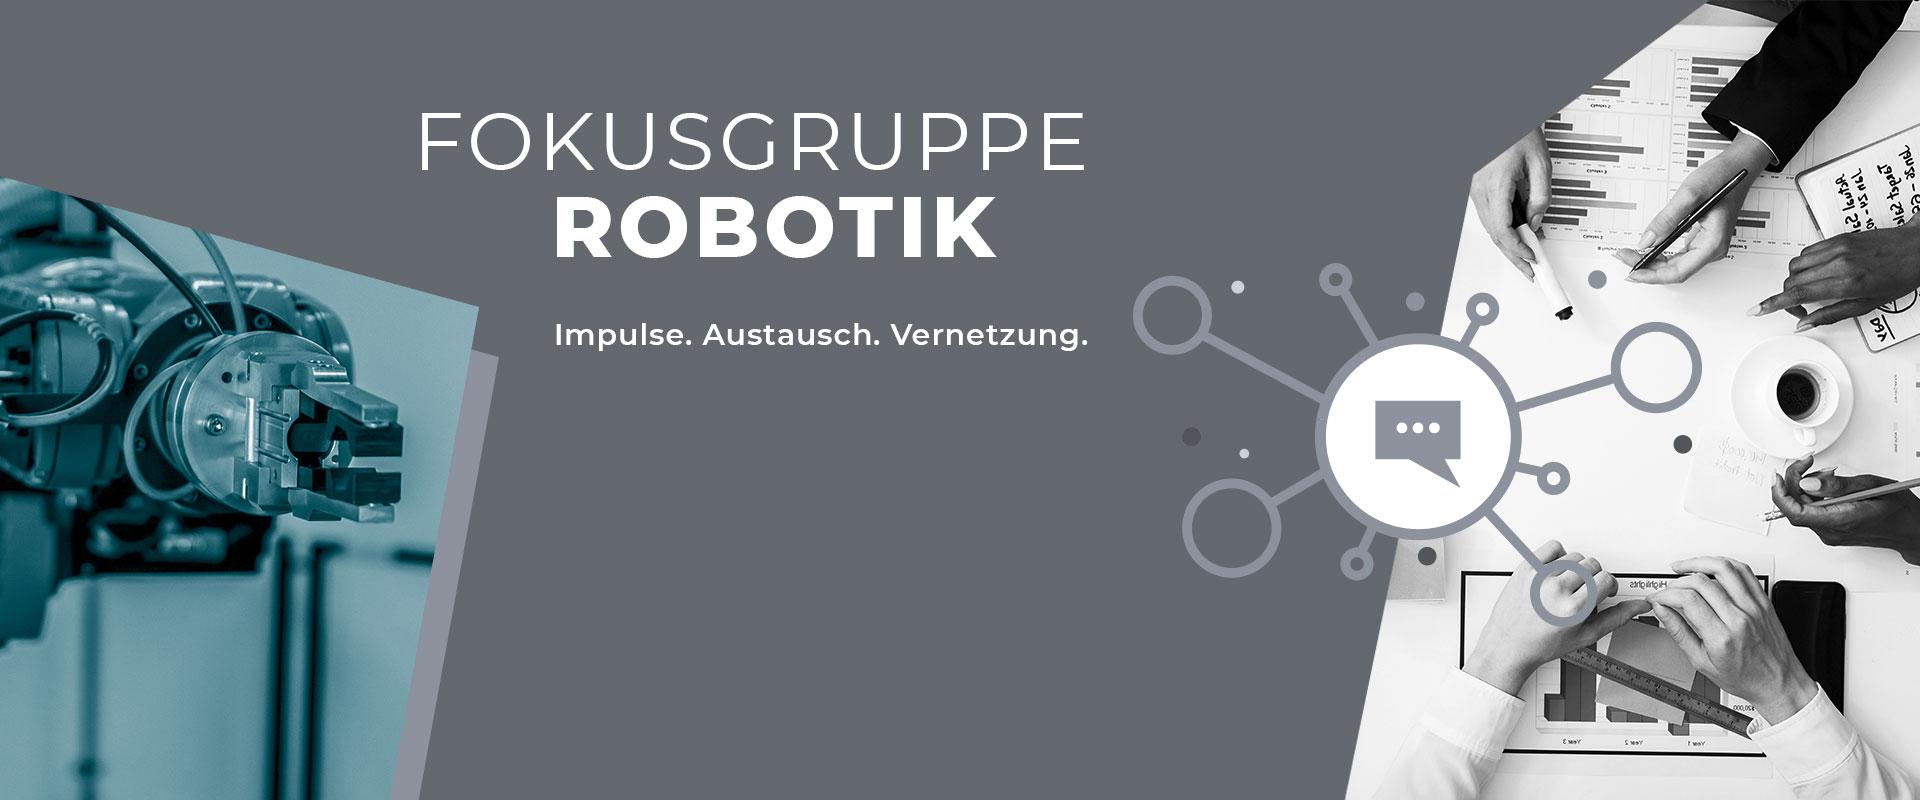 Fokusgruppen_Robotik_Website